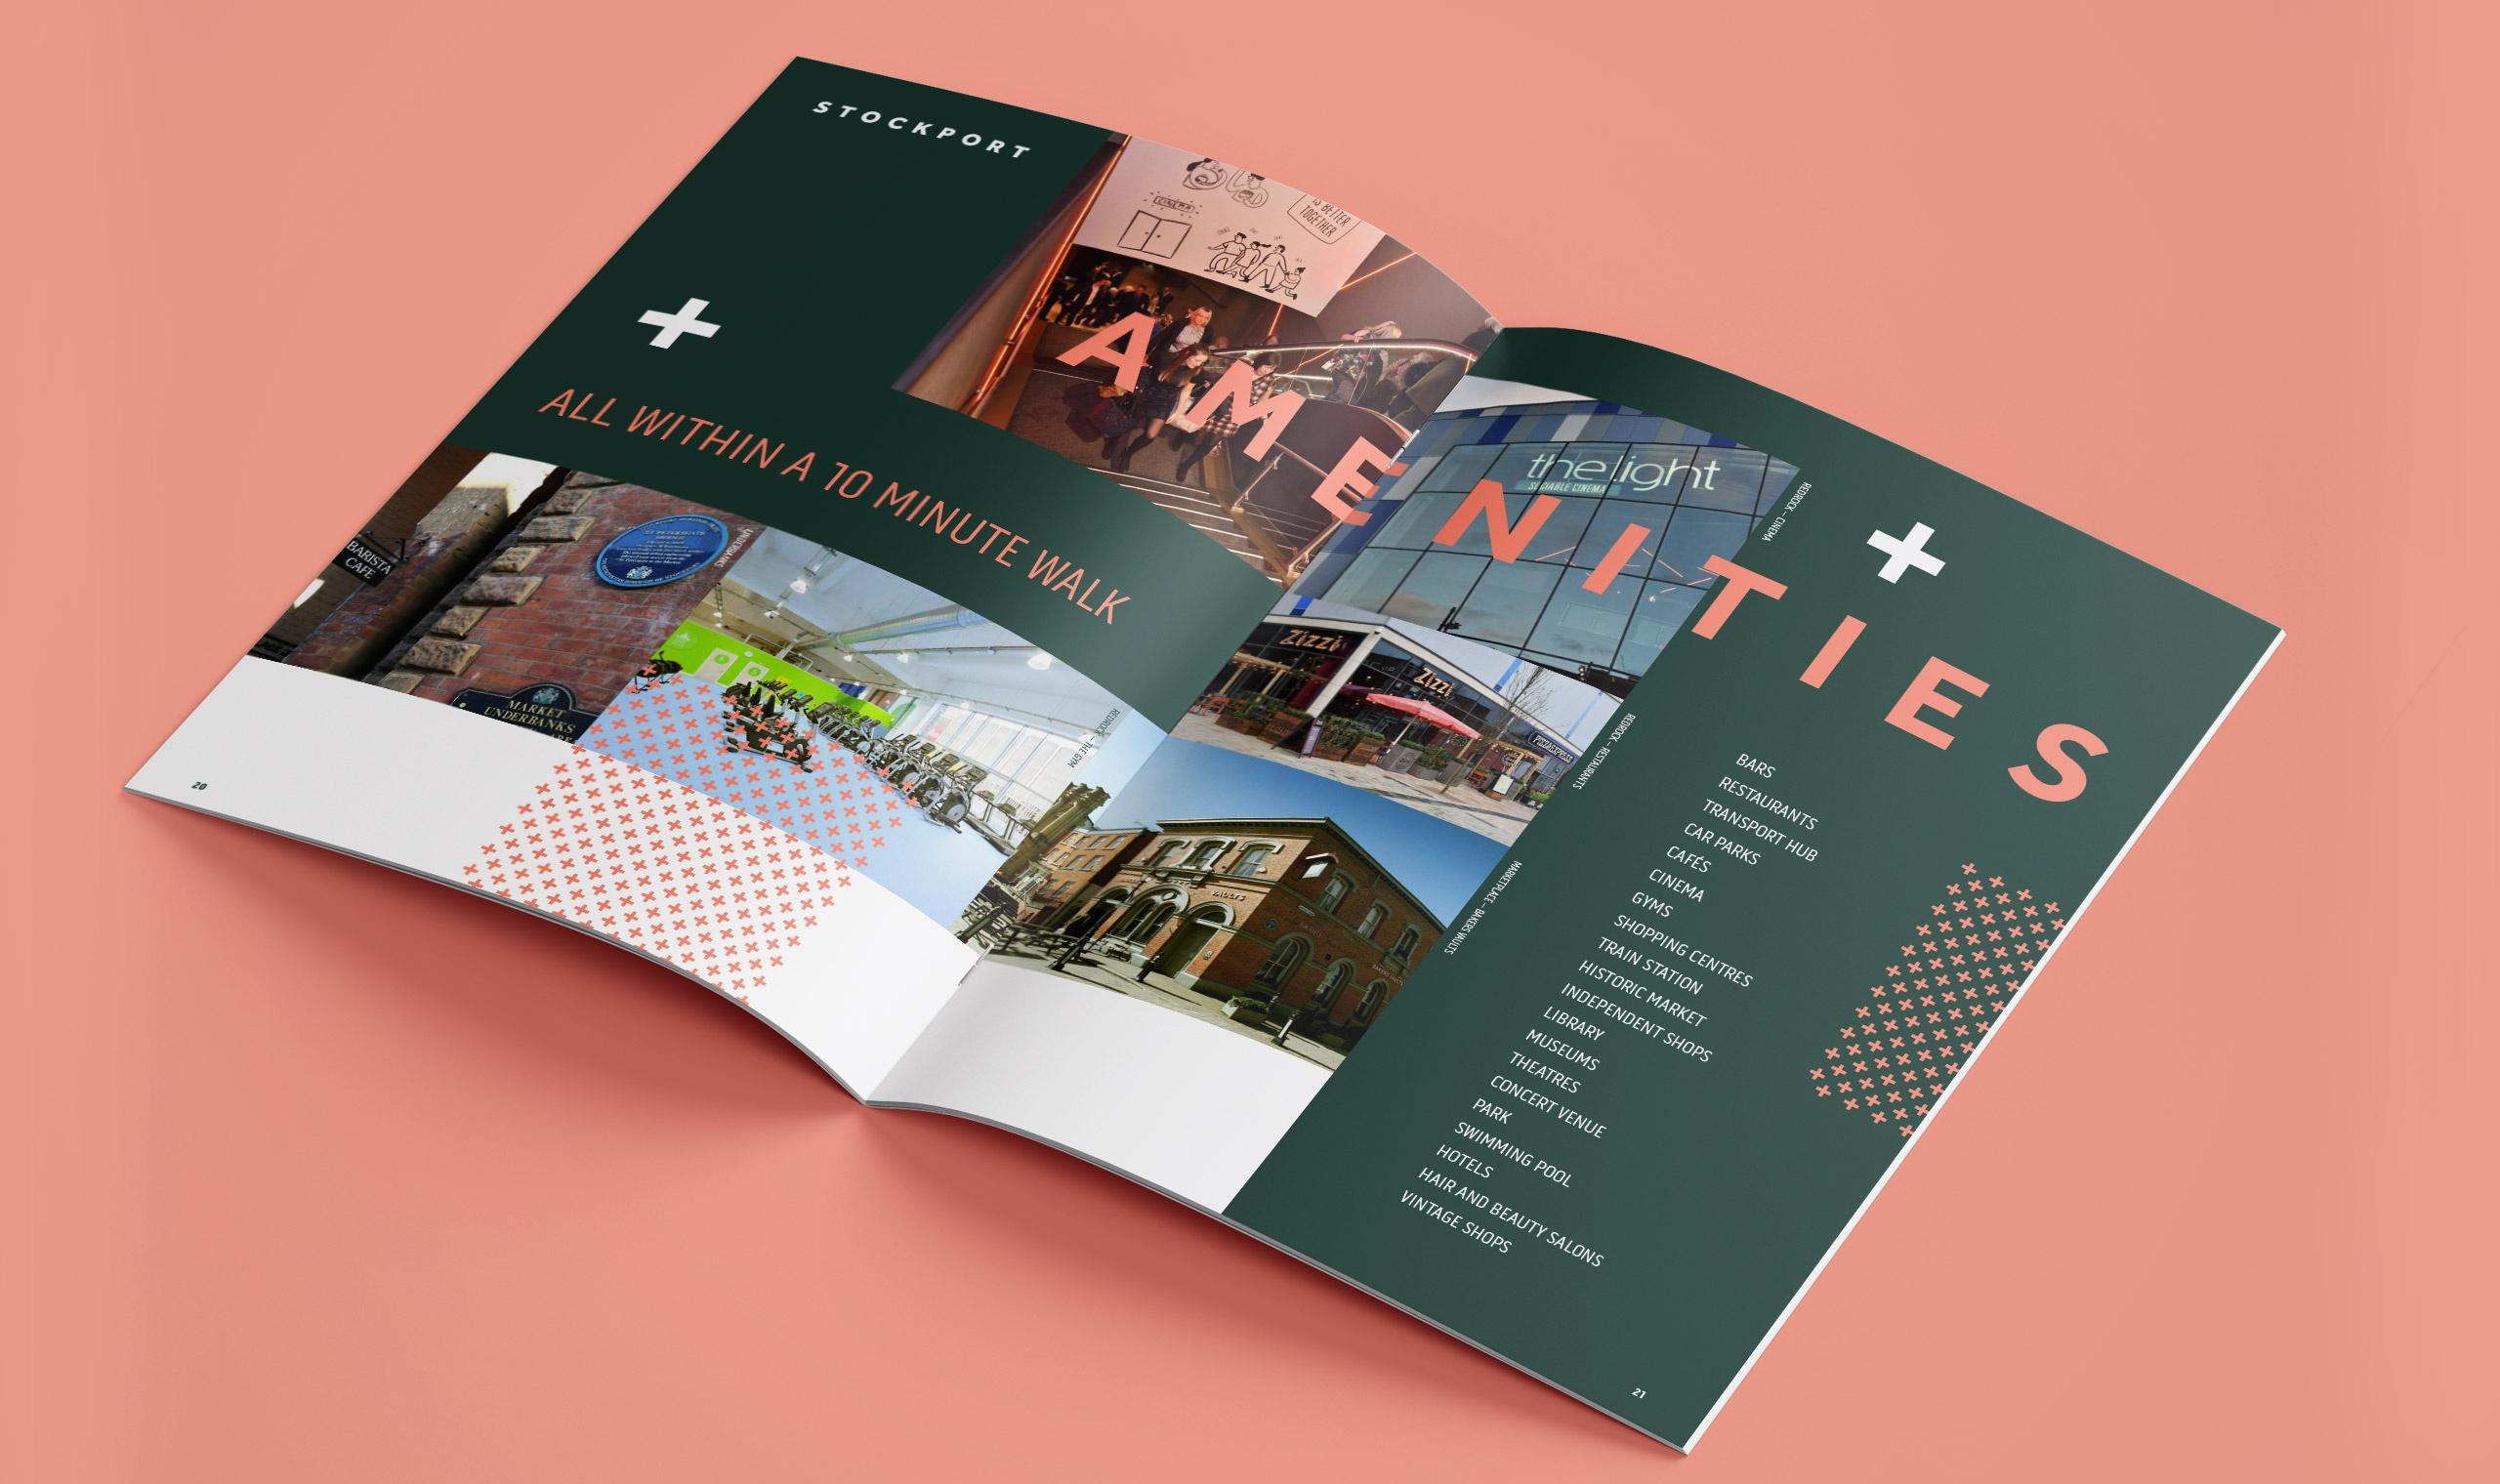 STOK Stockport Manchester Brochure Design